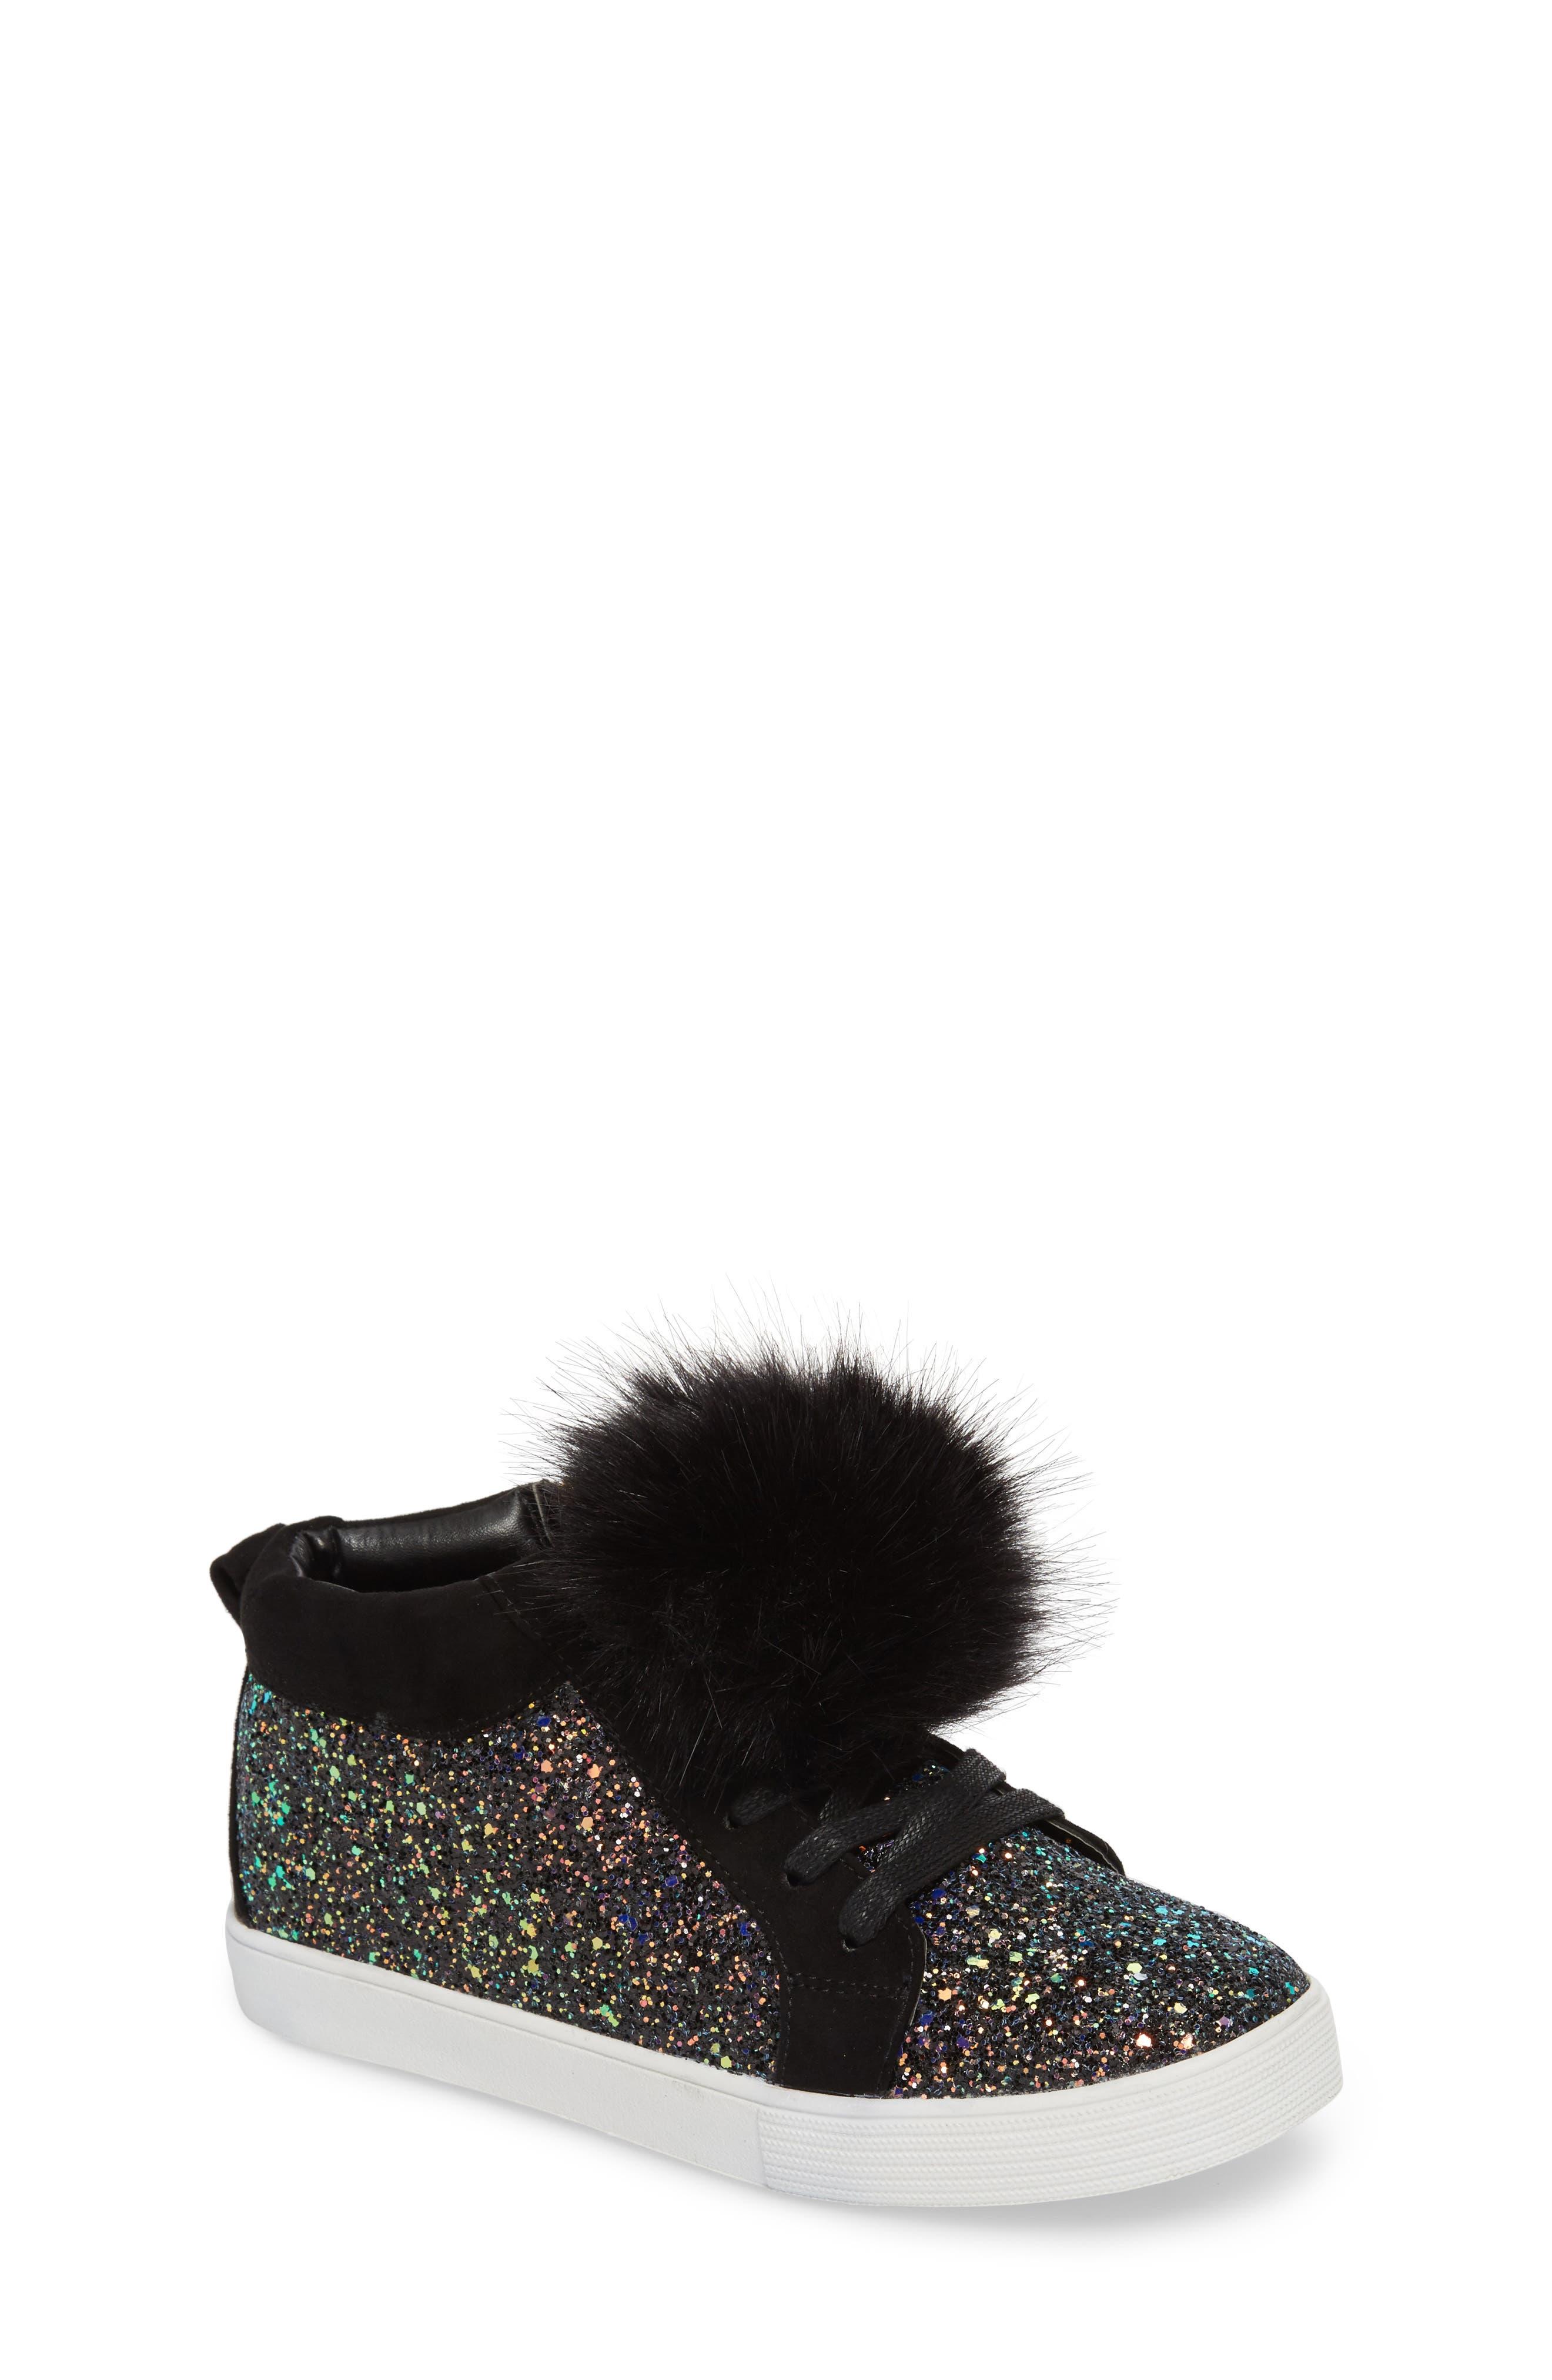 Bella Hira Faux Fur Glitter Pom Sneaker,                             Main thumbnail 1, color,                             Black Multi Chunky Glitter